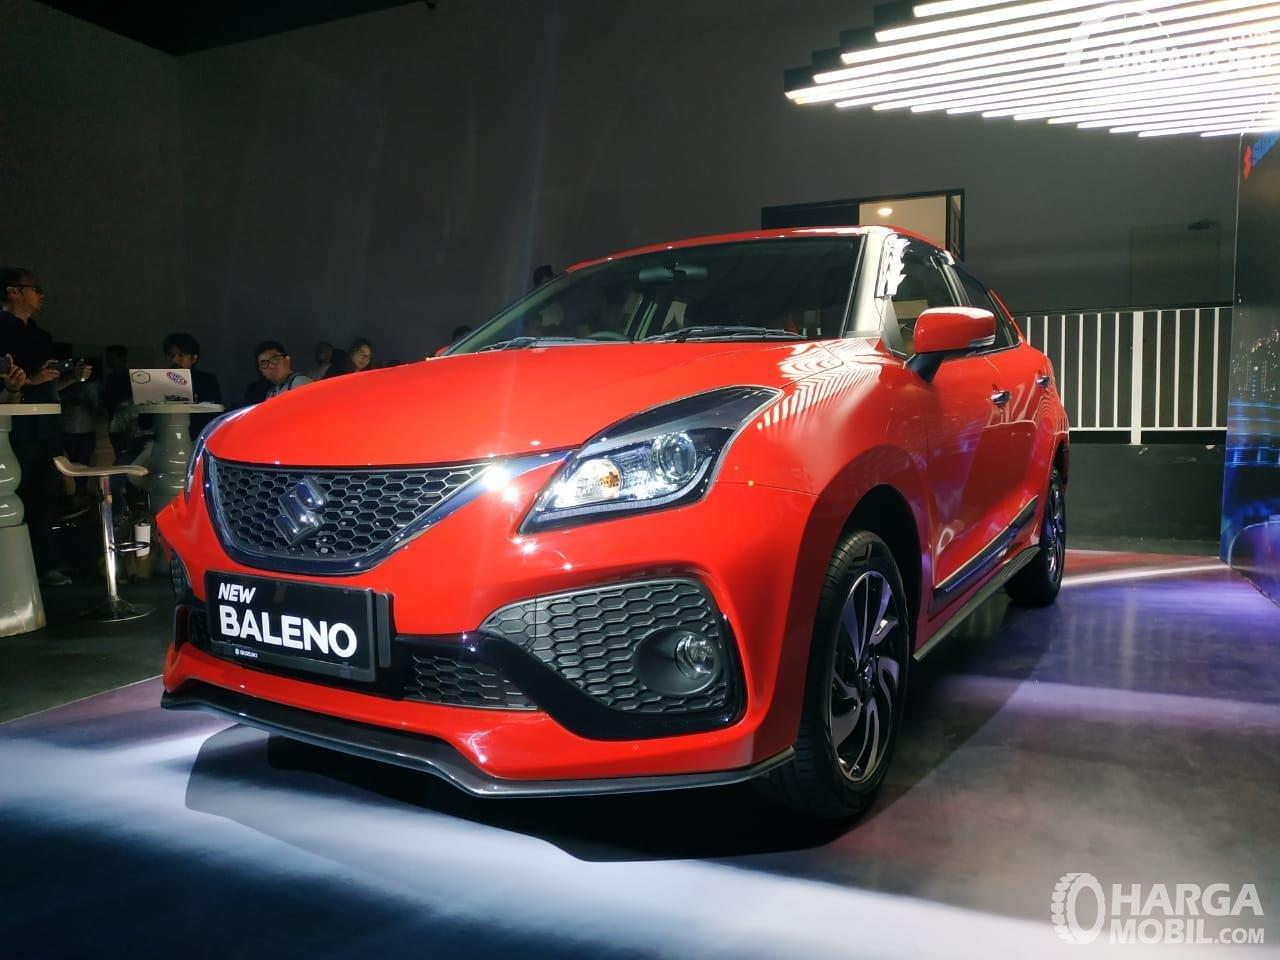 Foto Suzuki New Baleno facelift 2020 tampak dari samping depan